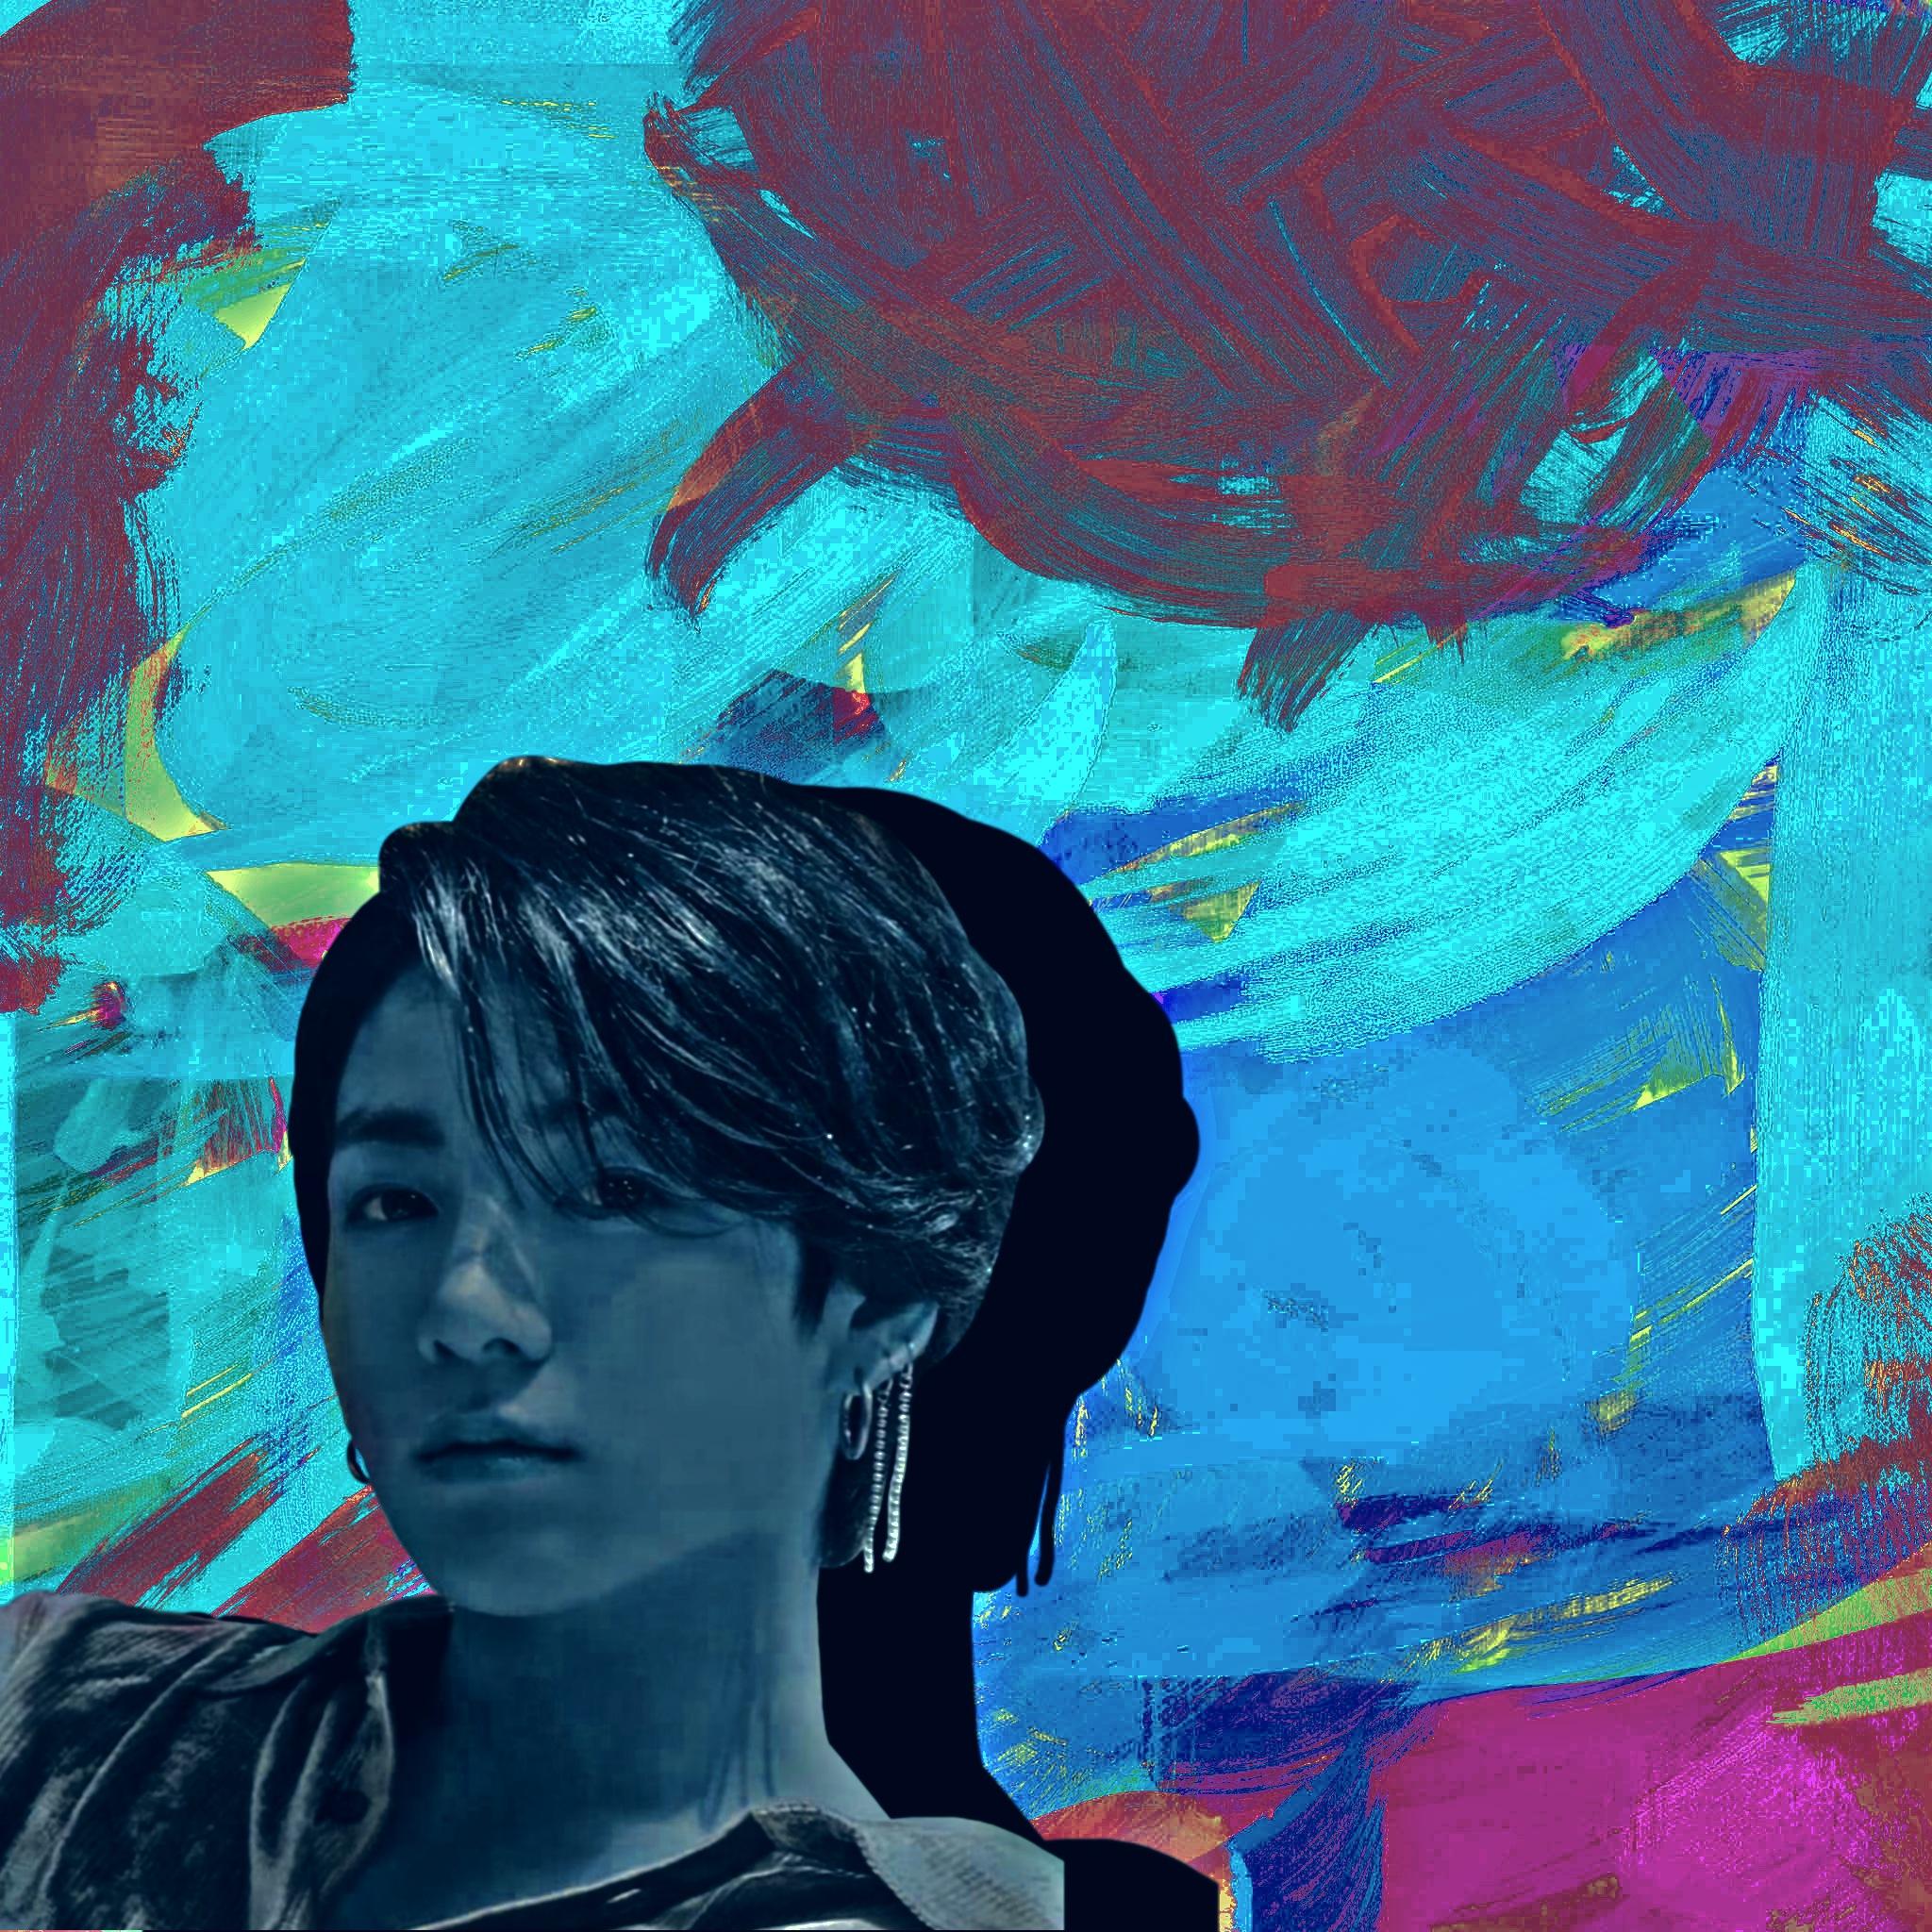 Boy face illustration